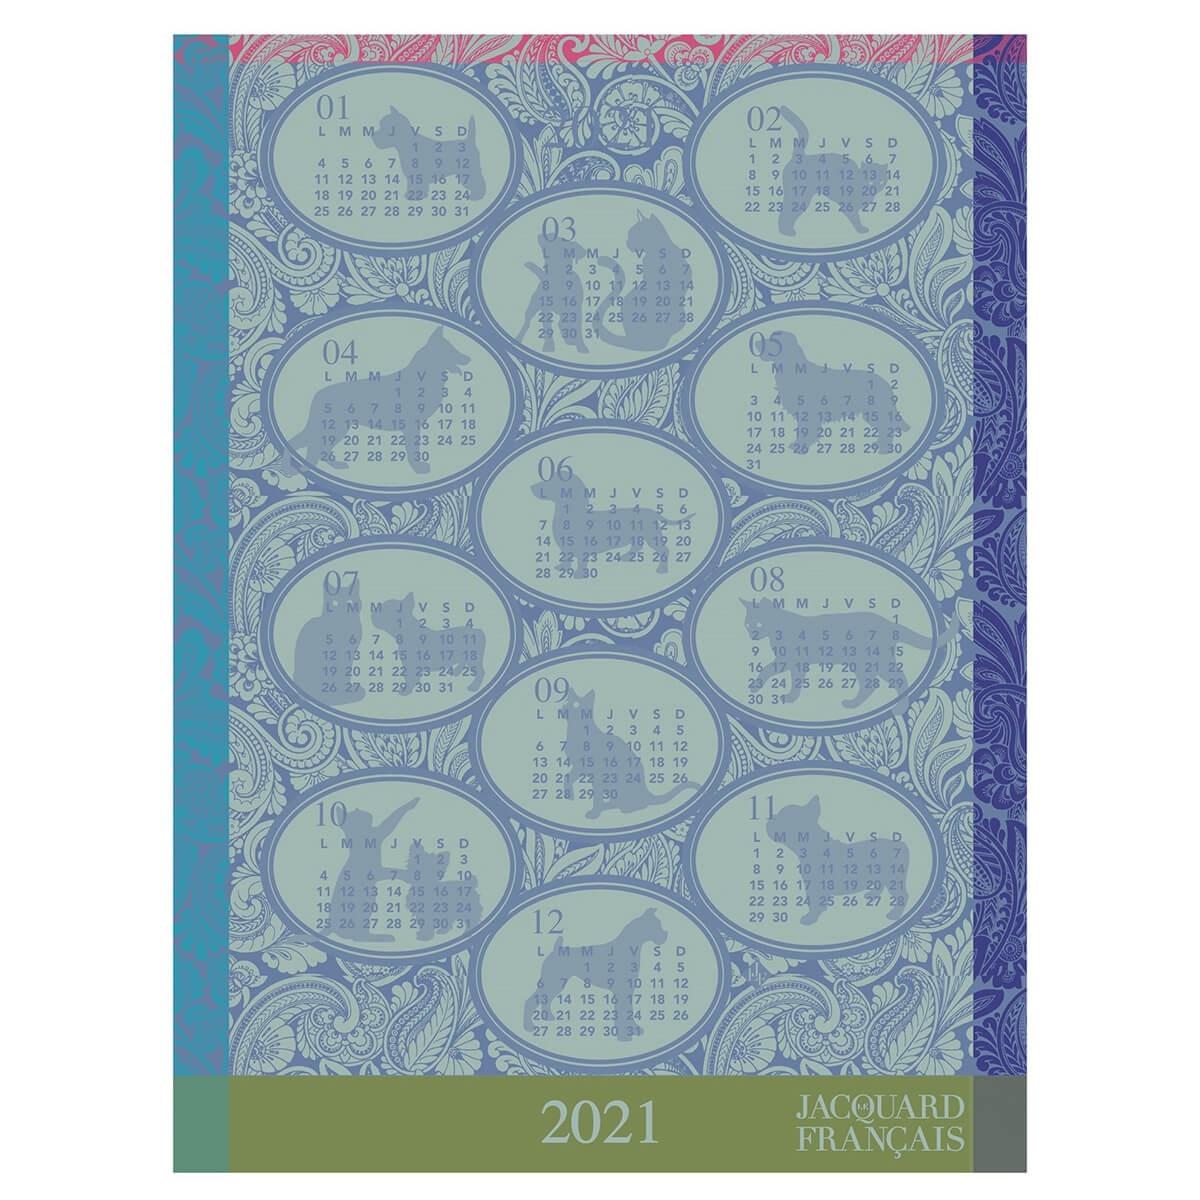 Le Jacquard Francais 2021 Calendar Tea Towel